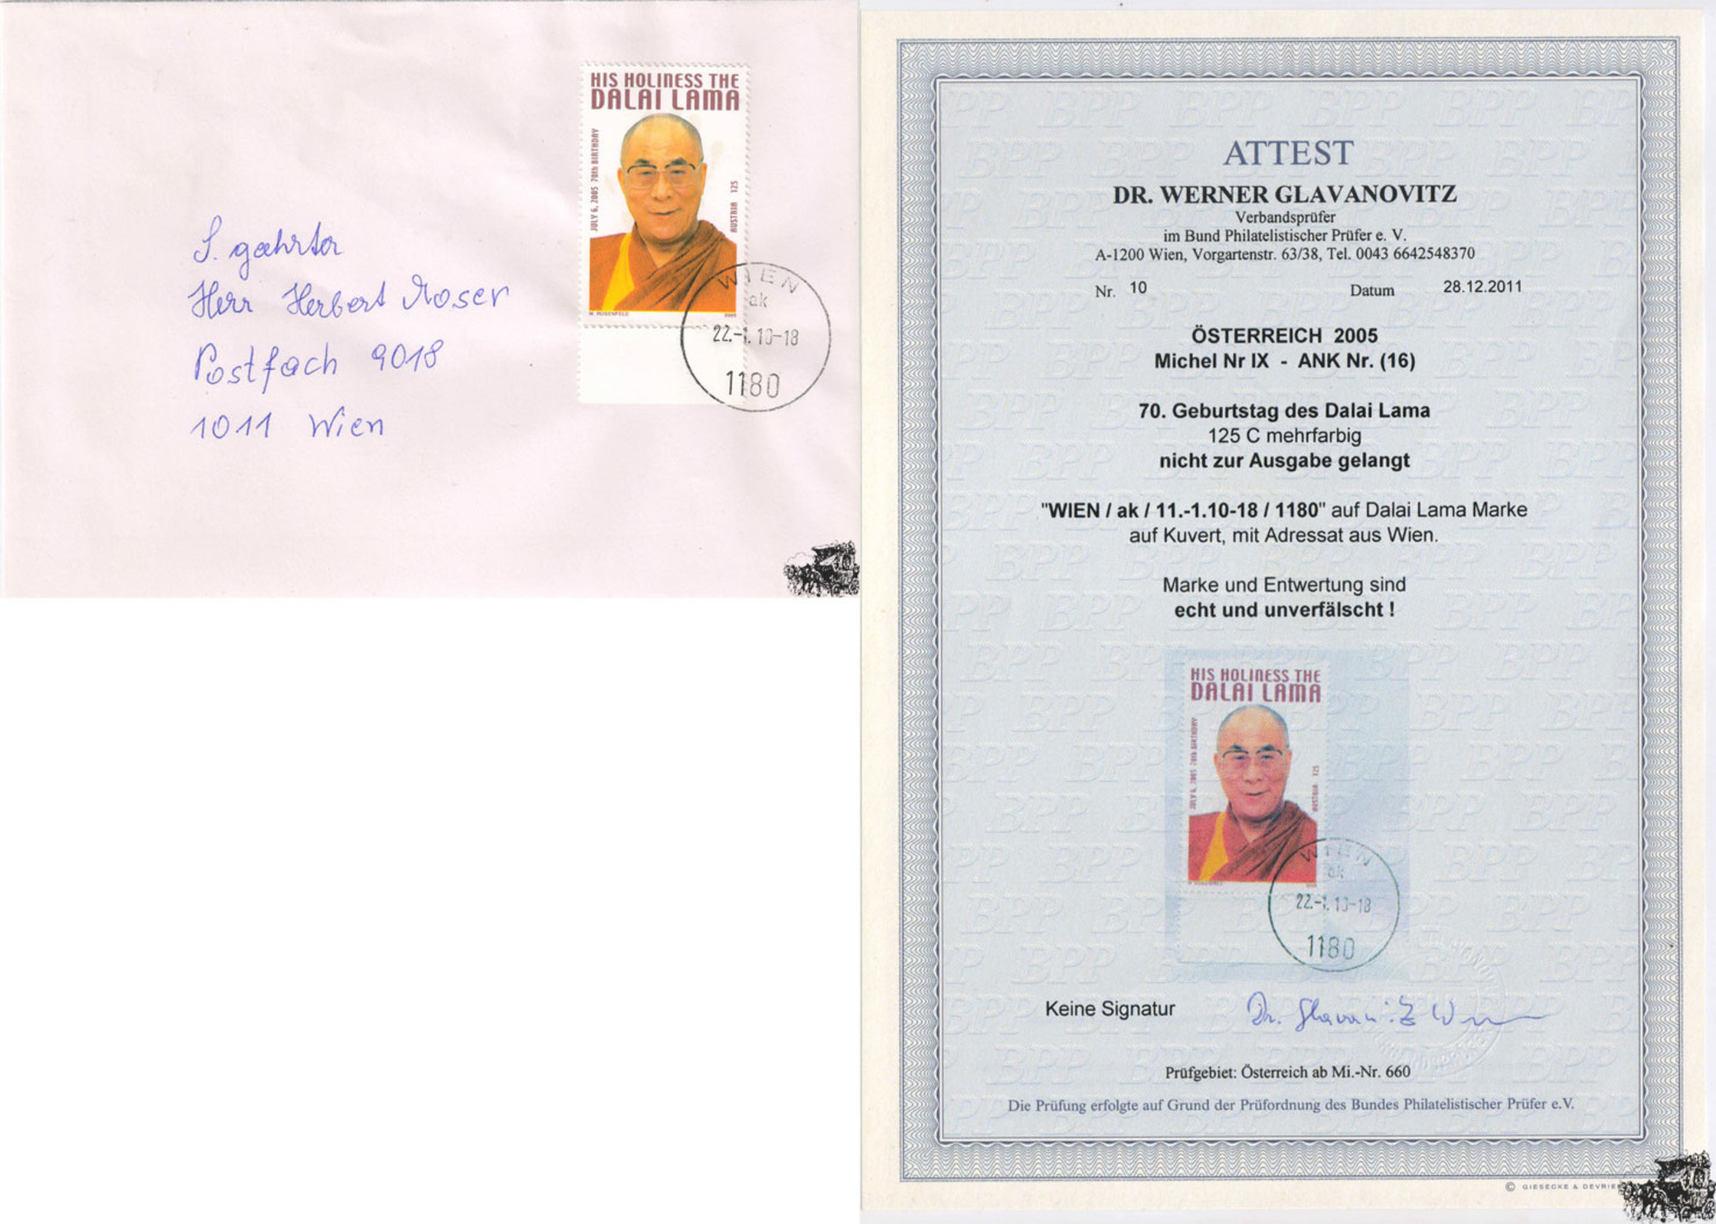 österreich 2005 Brief 125 Dalai Lama Nicht Verausgabte Ma Shops